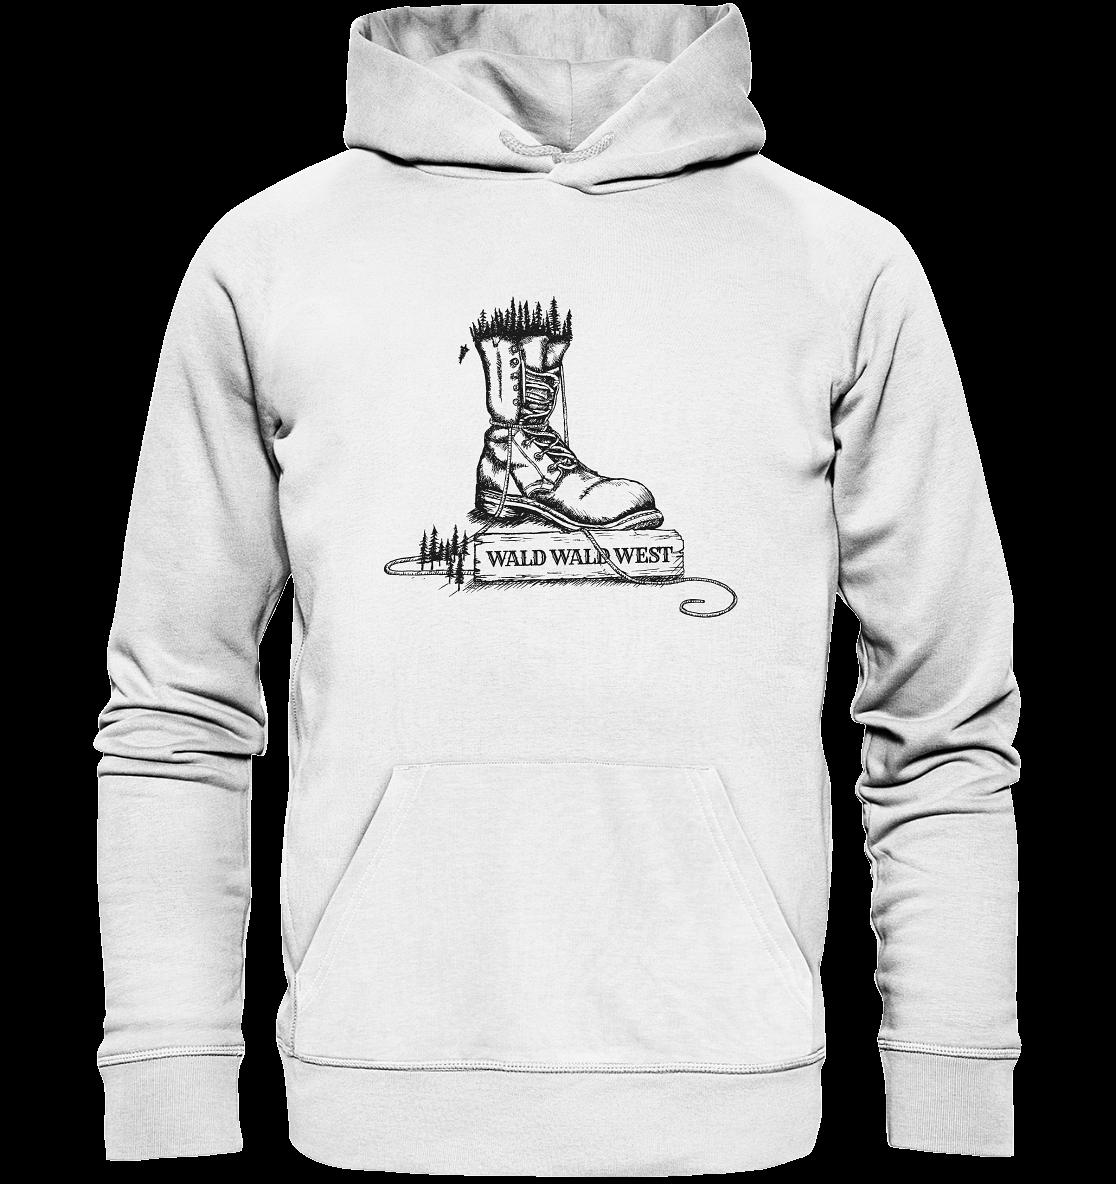 front-organic-hoodie-f8f8f8-1116x.png